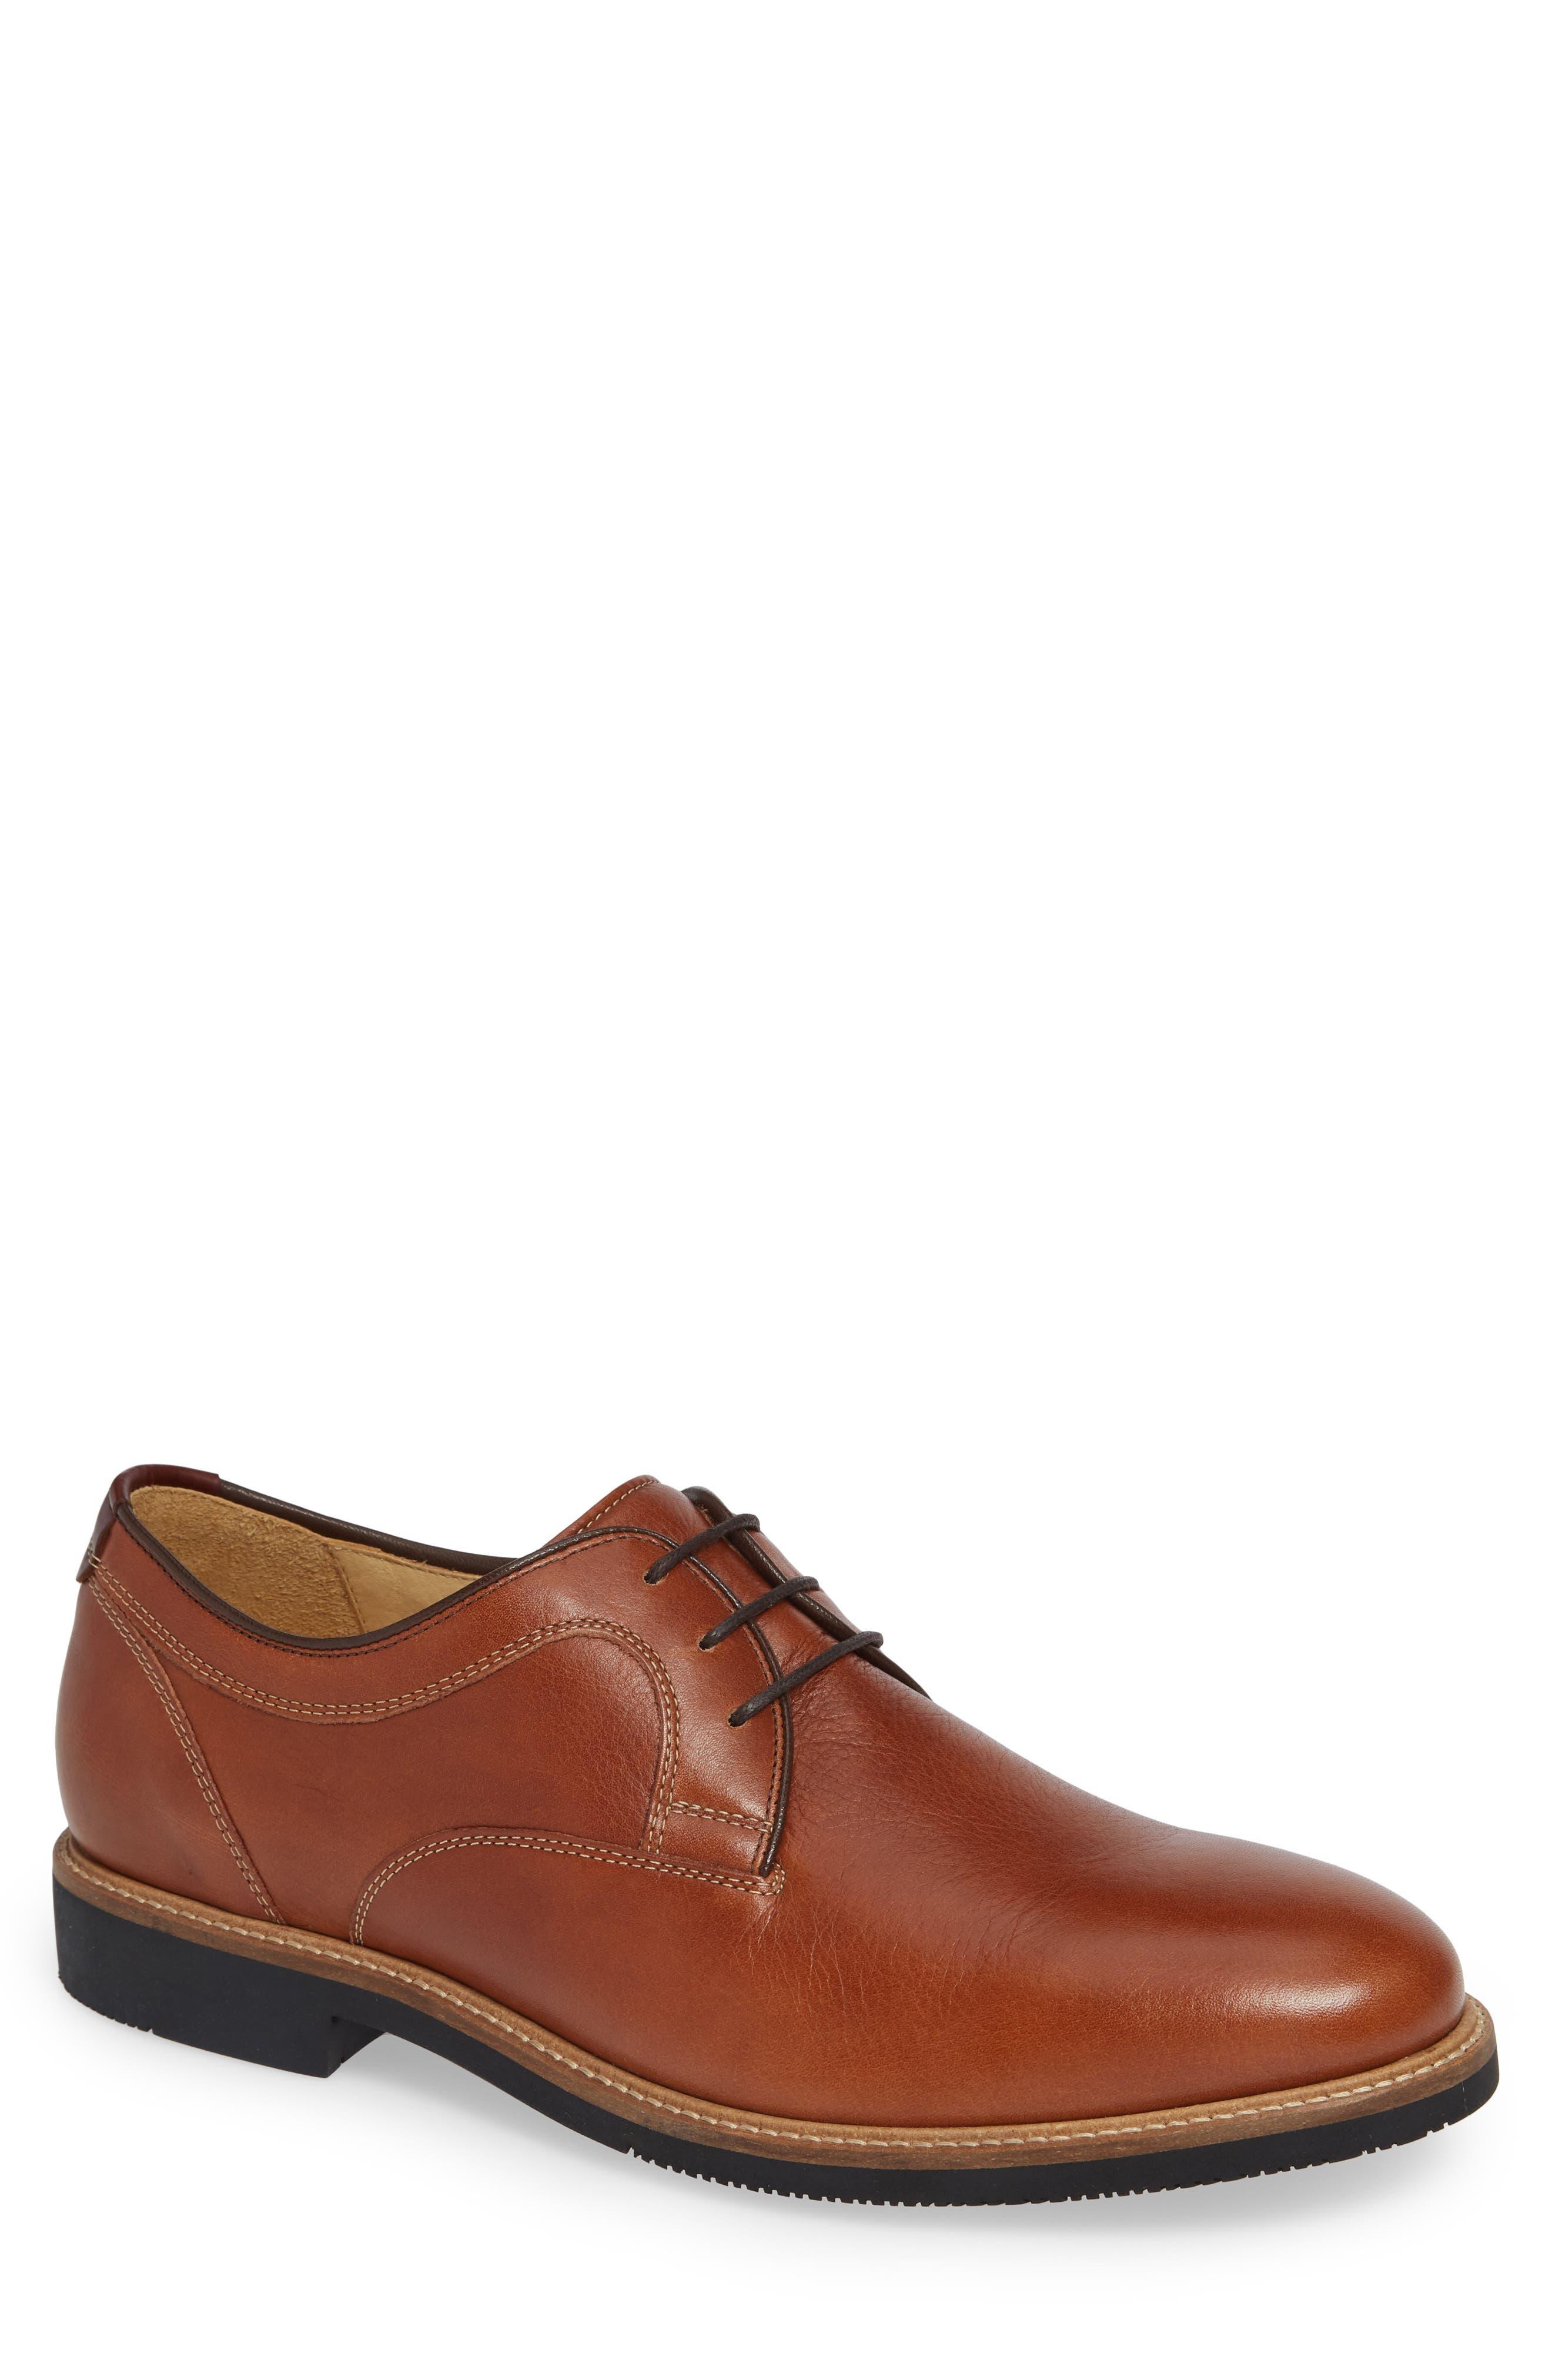 Barlow Plain Toe Derby,                             Main thumbnail 1, color,                             Dark Tan Leather